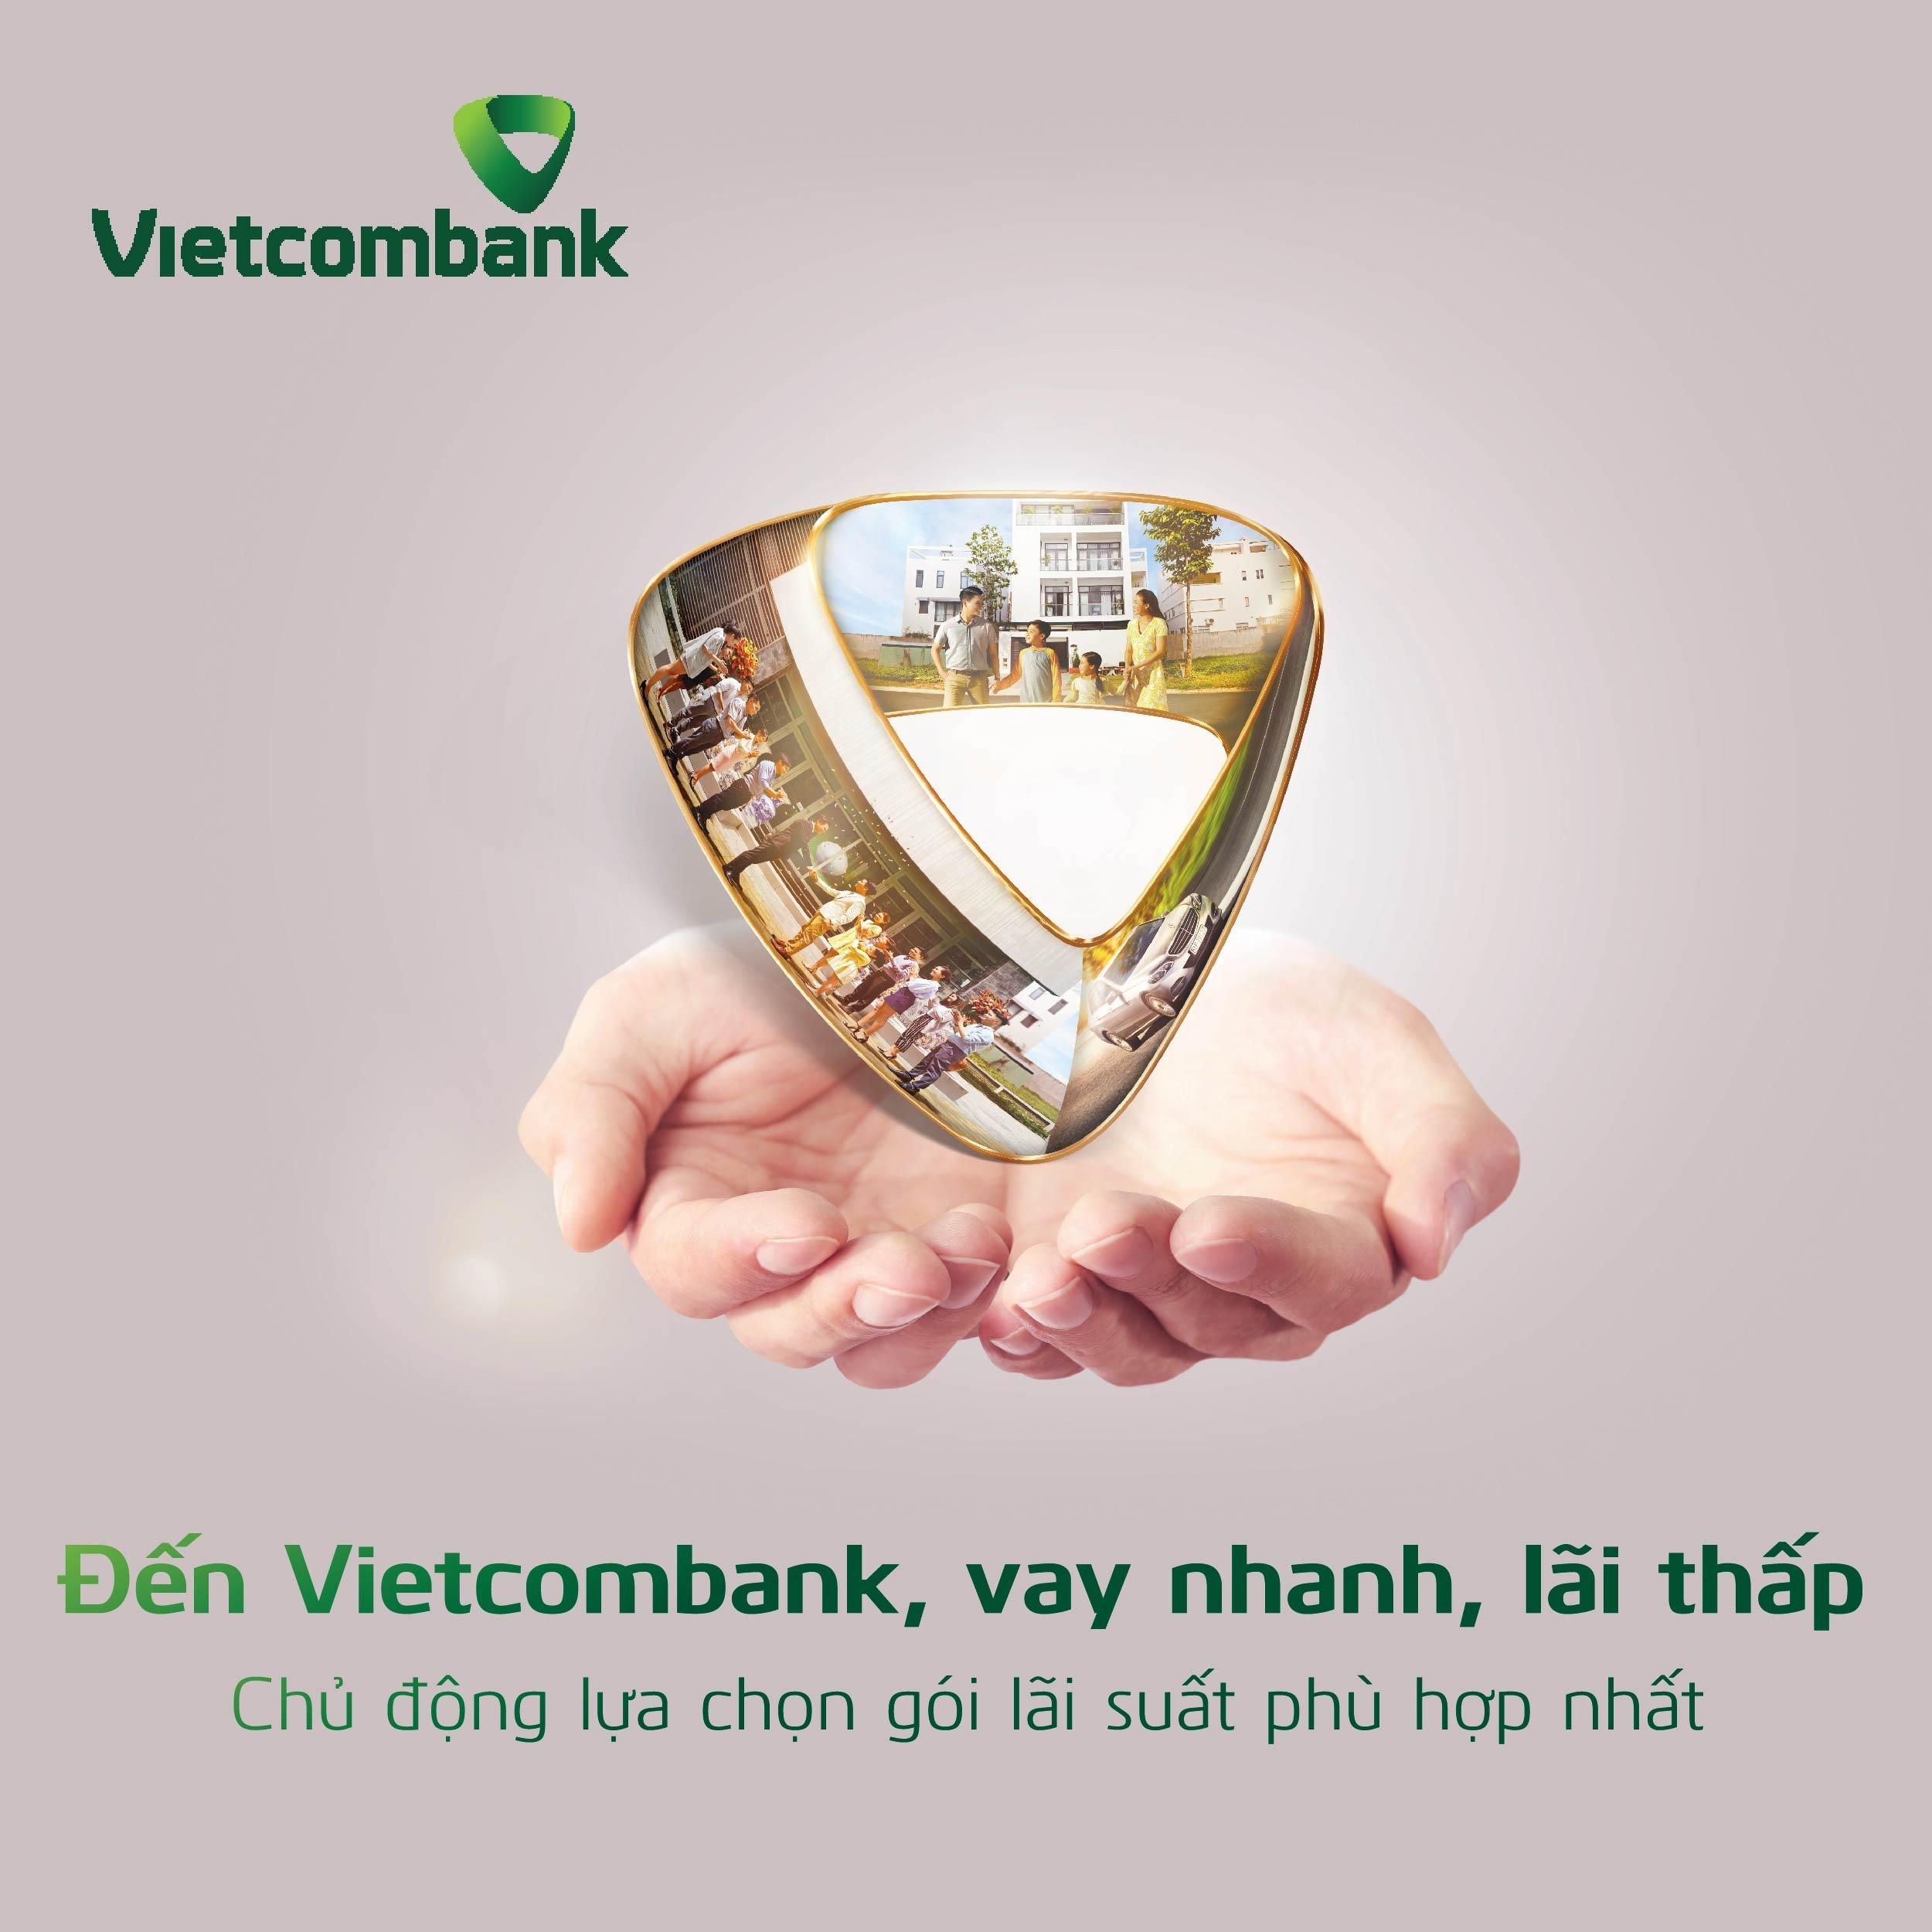 vietcombank dong loat trien khai cac chuong trinh uu dai lai suat danh cho khach hang ca nhan va khach hang sme vay von